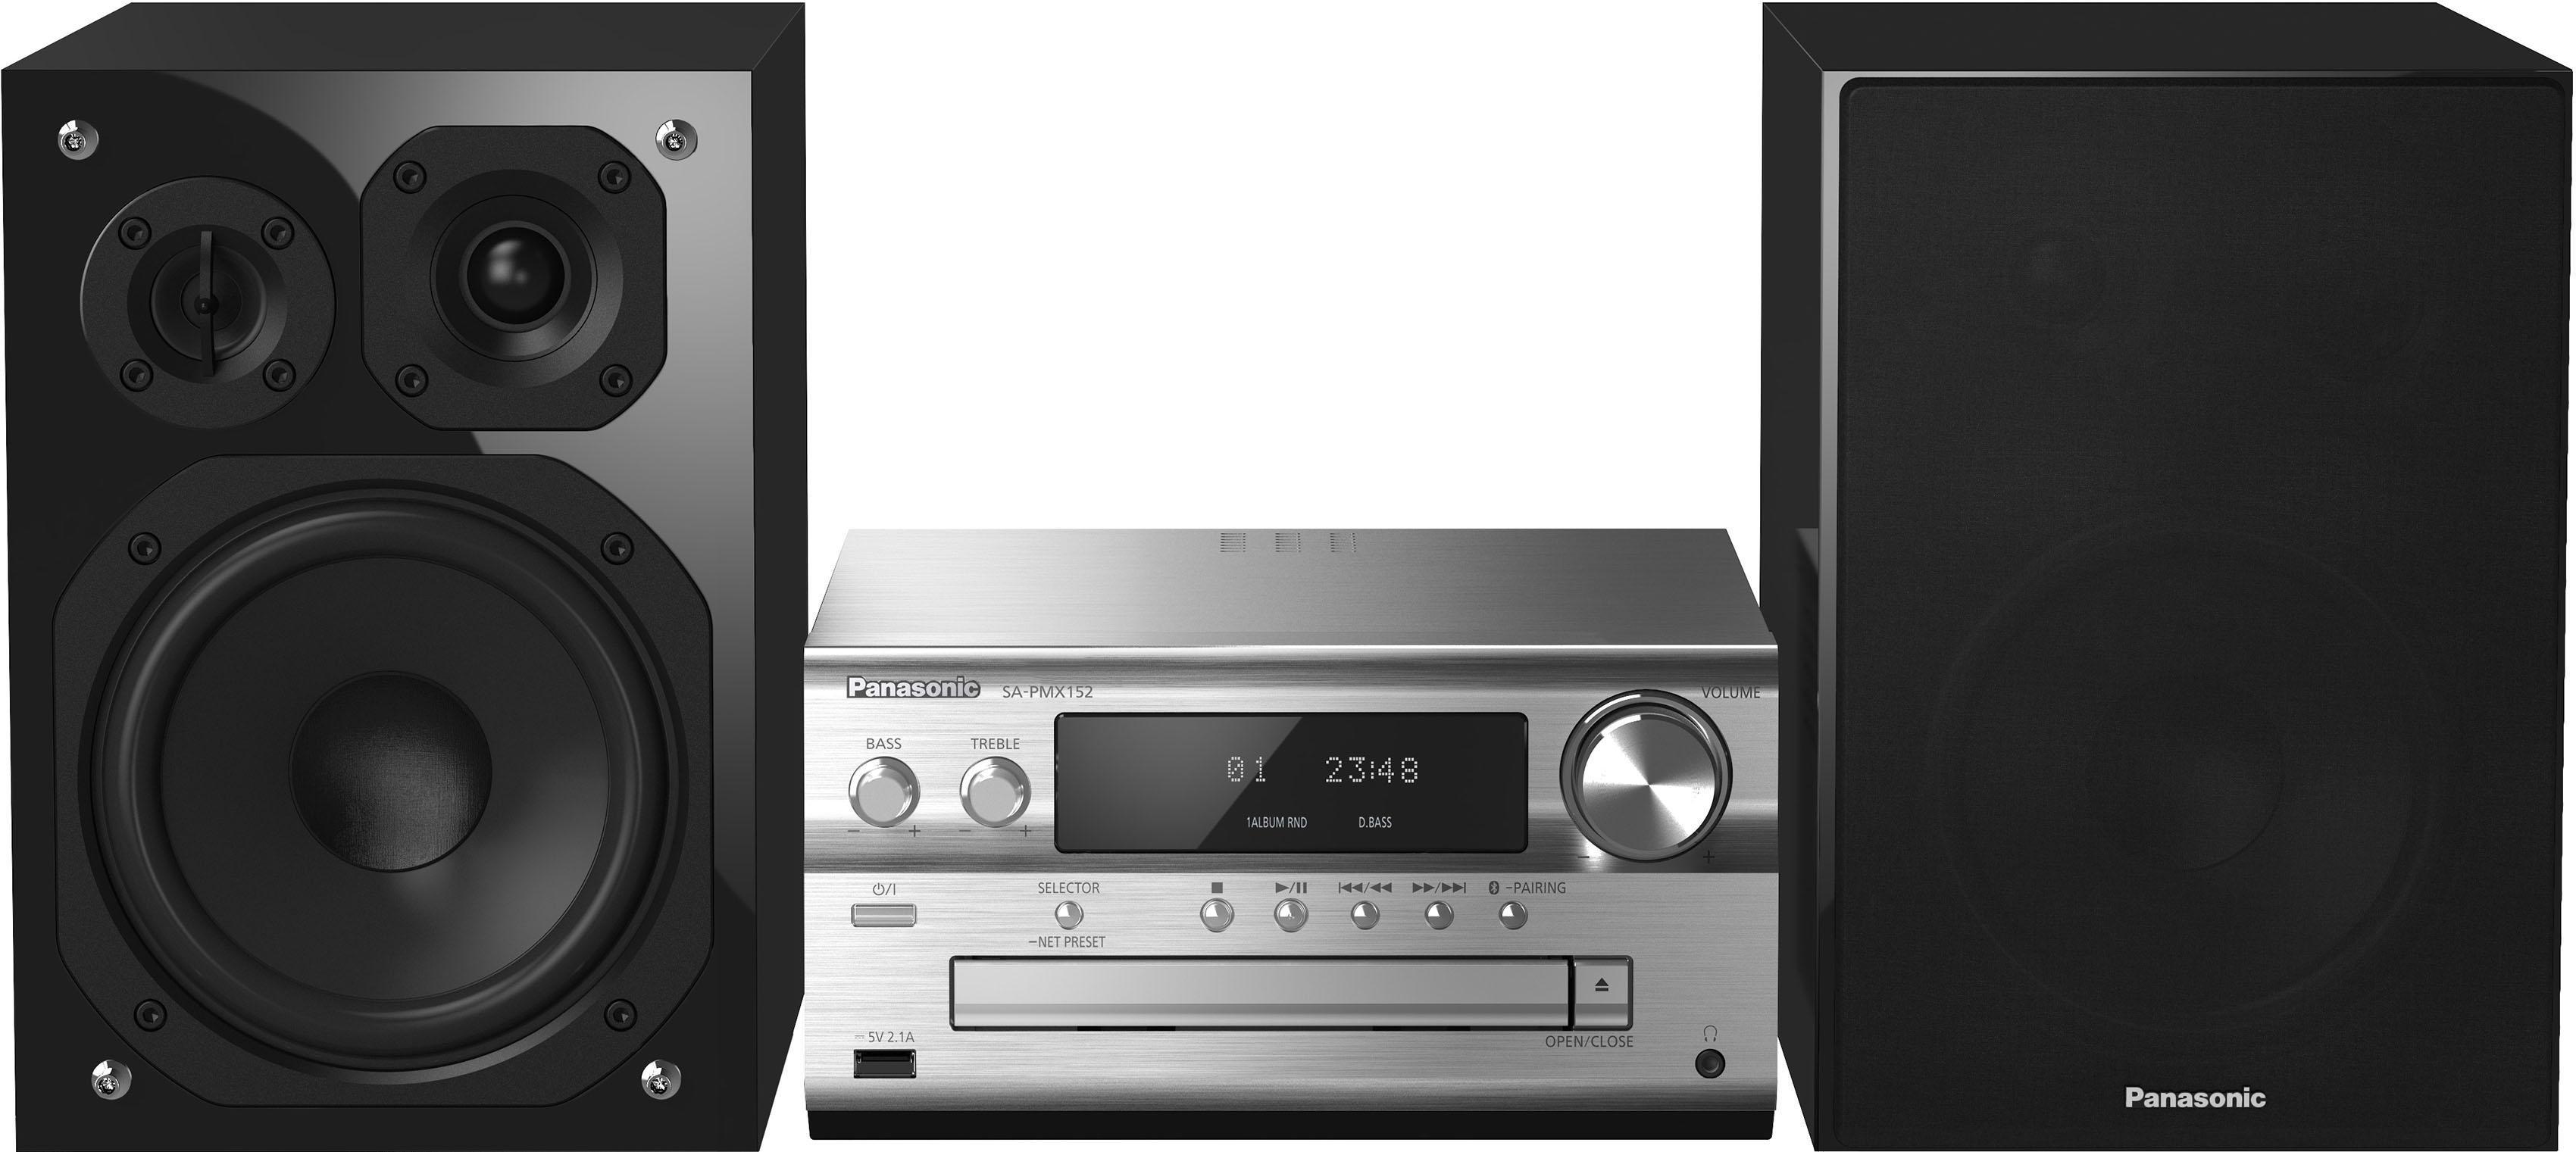 Panasonic SC-PMX152 ALL Connected hifi-systeem - verschillende betaalmethodes